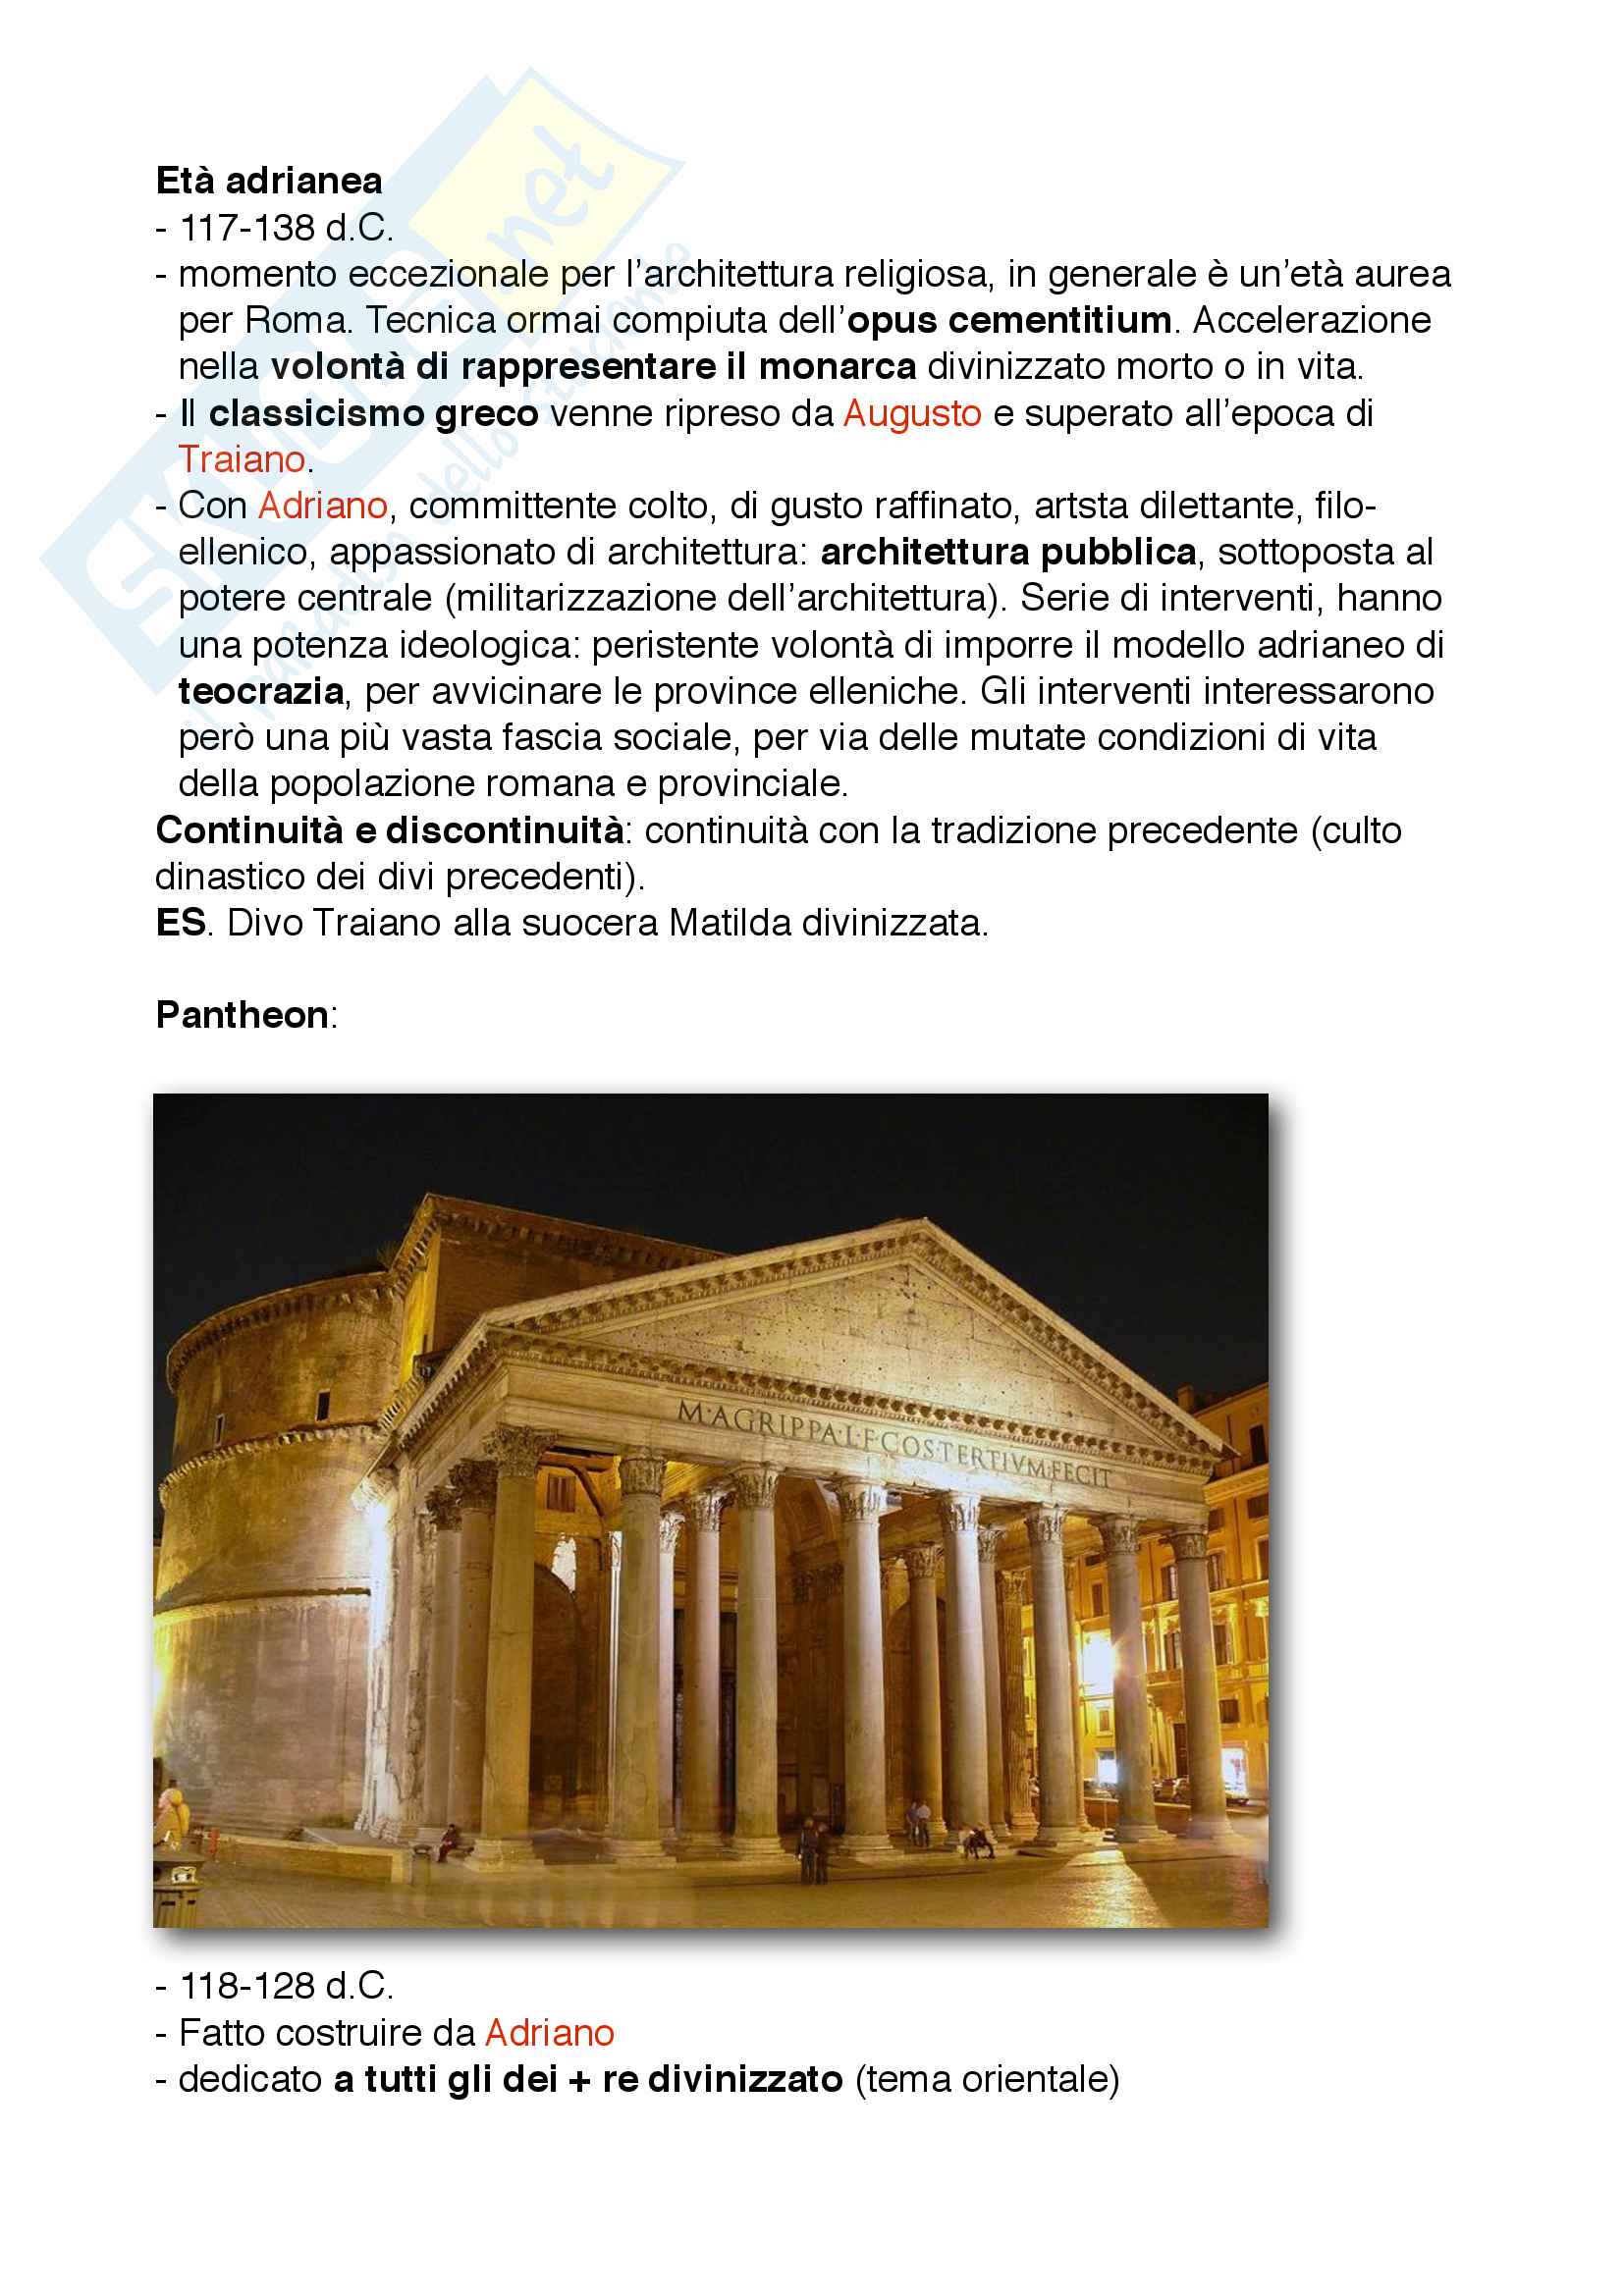 22 Età adrianea e Pantheon